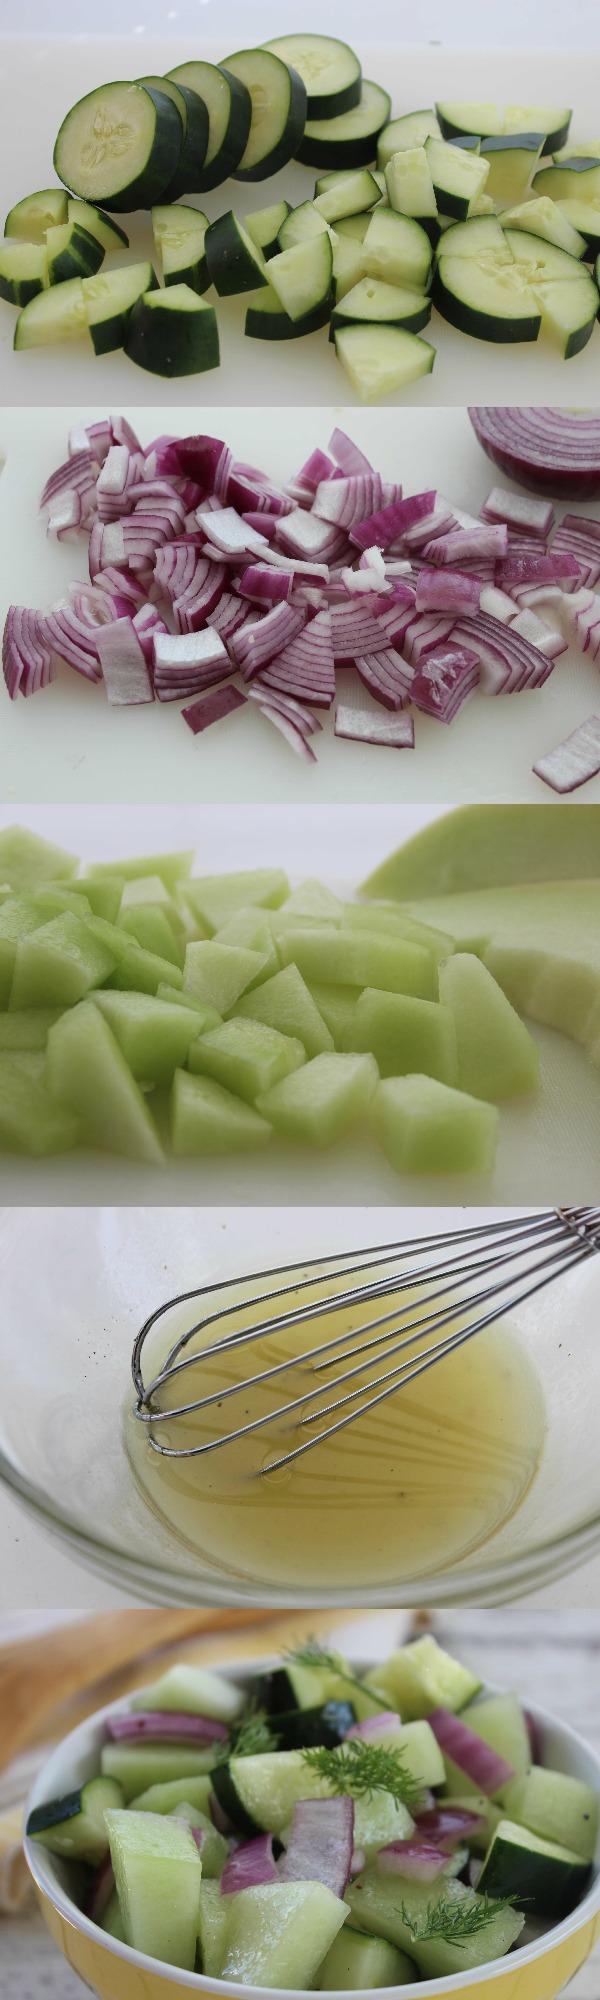 Honeydew Cucumber Salad for Summer Salad